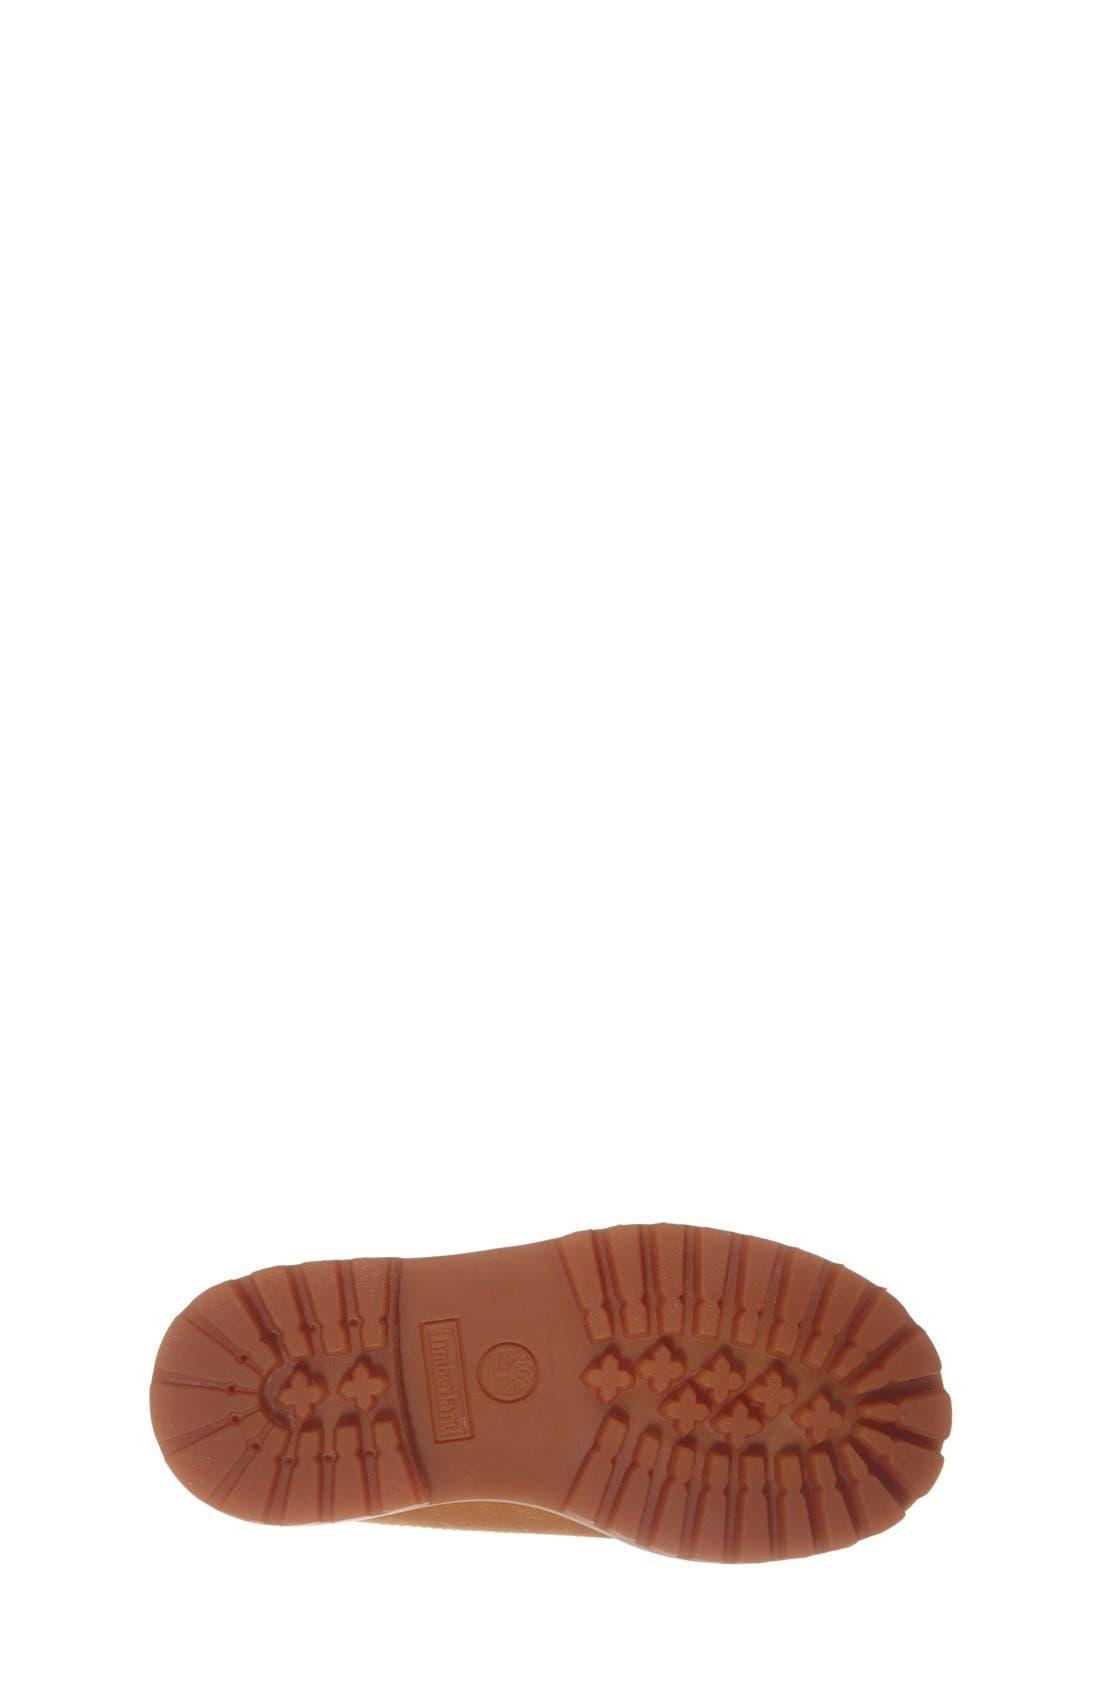 Alternate Image 4  - Timberland '6 Premium' Waterproof Leather Boot (Walker & Toddler)